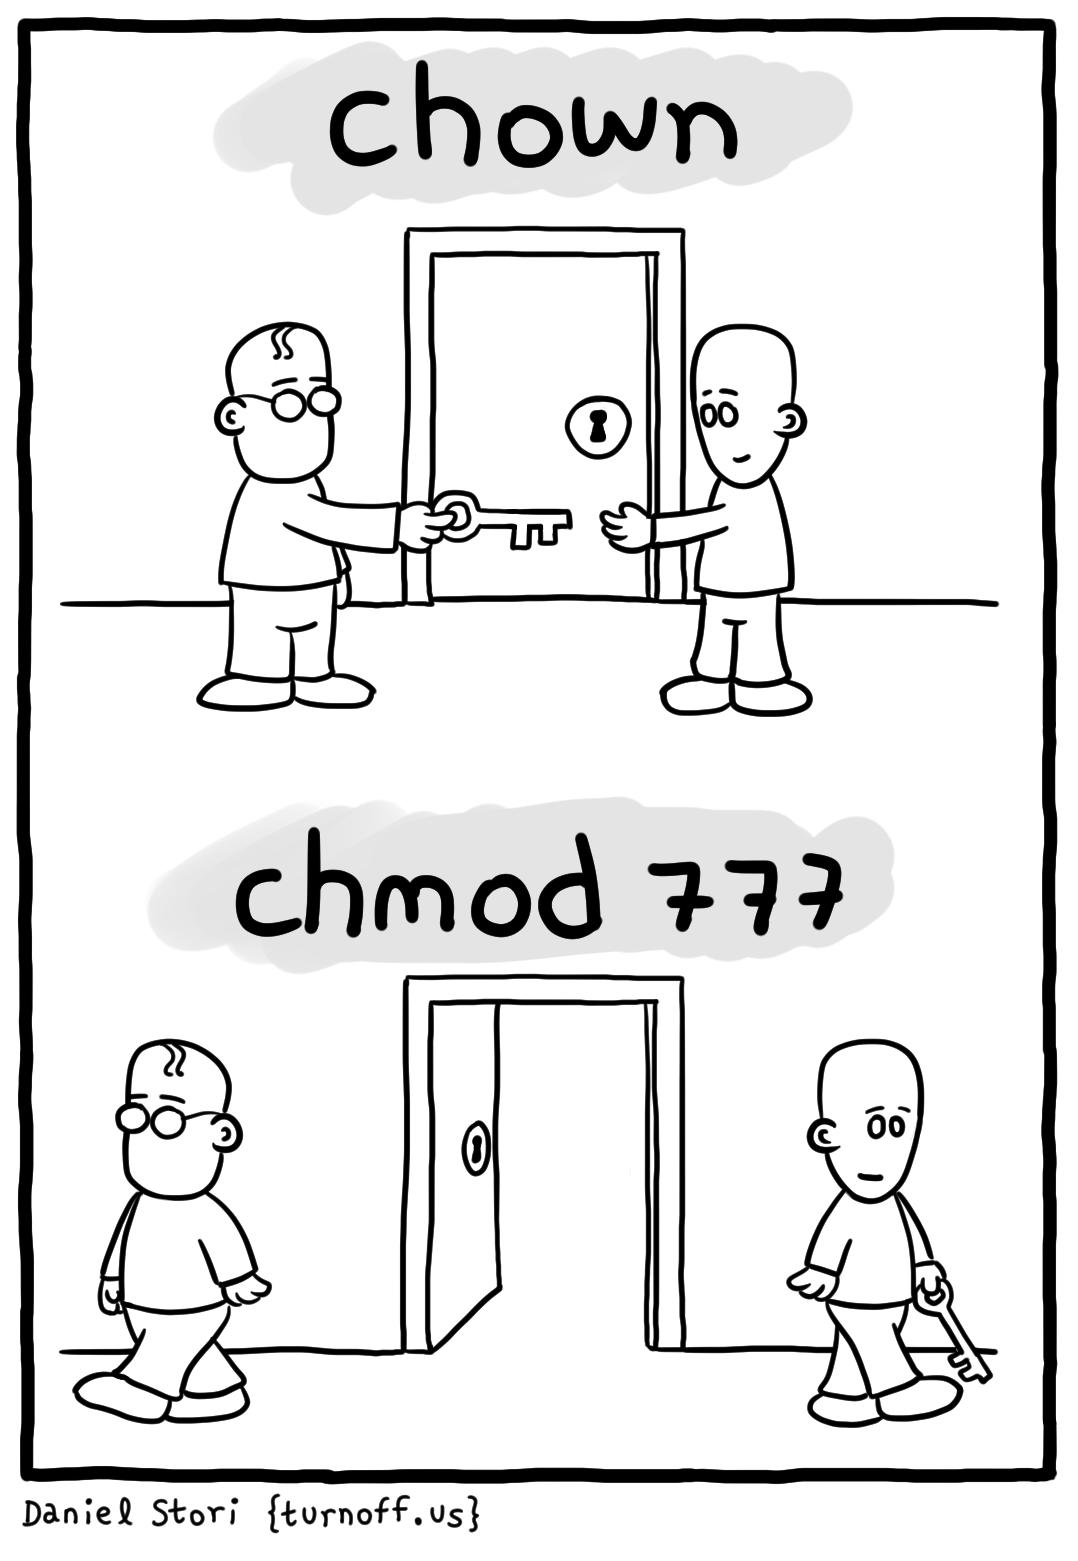 chown - chmod